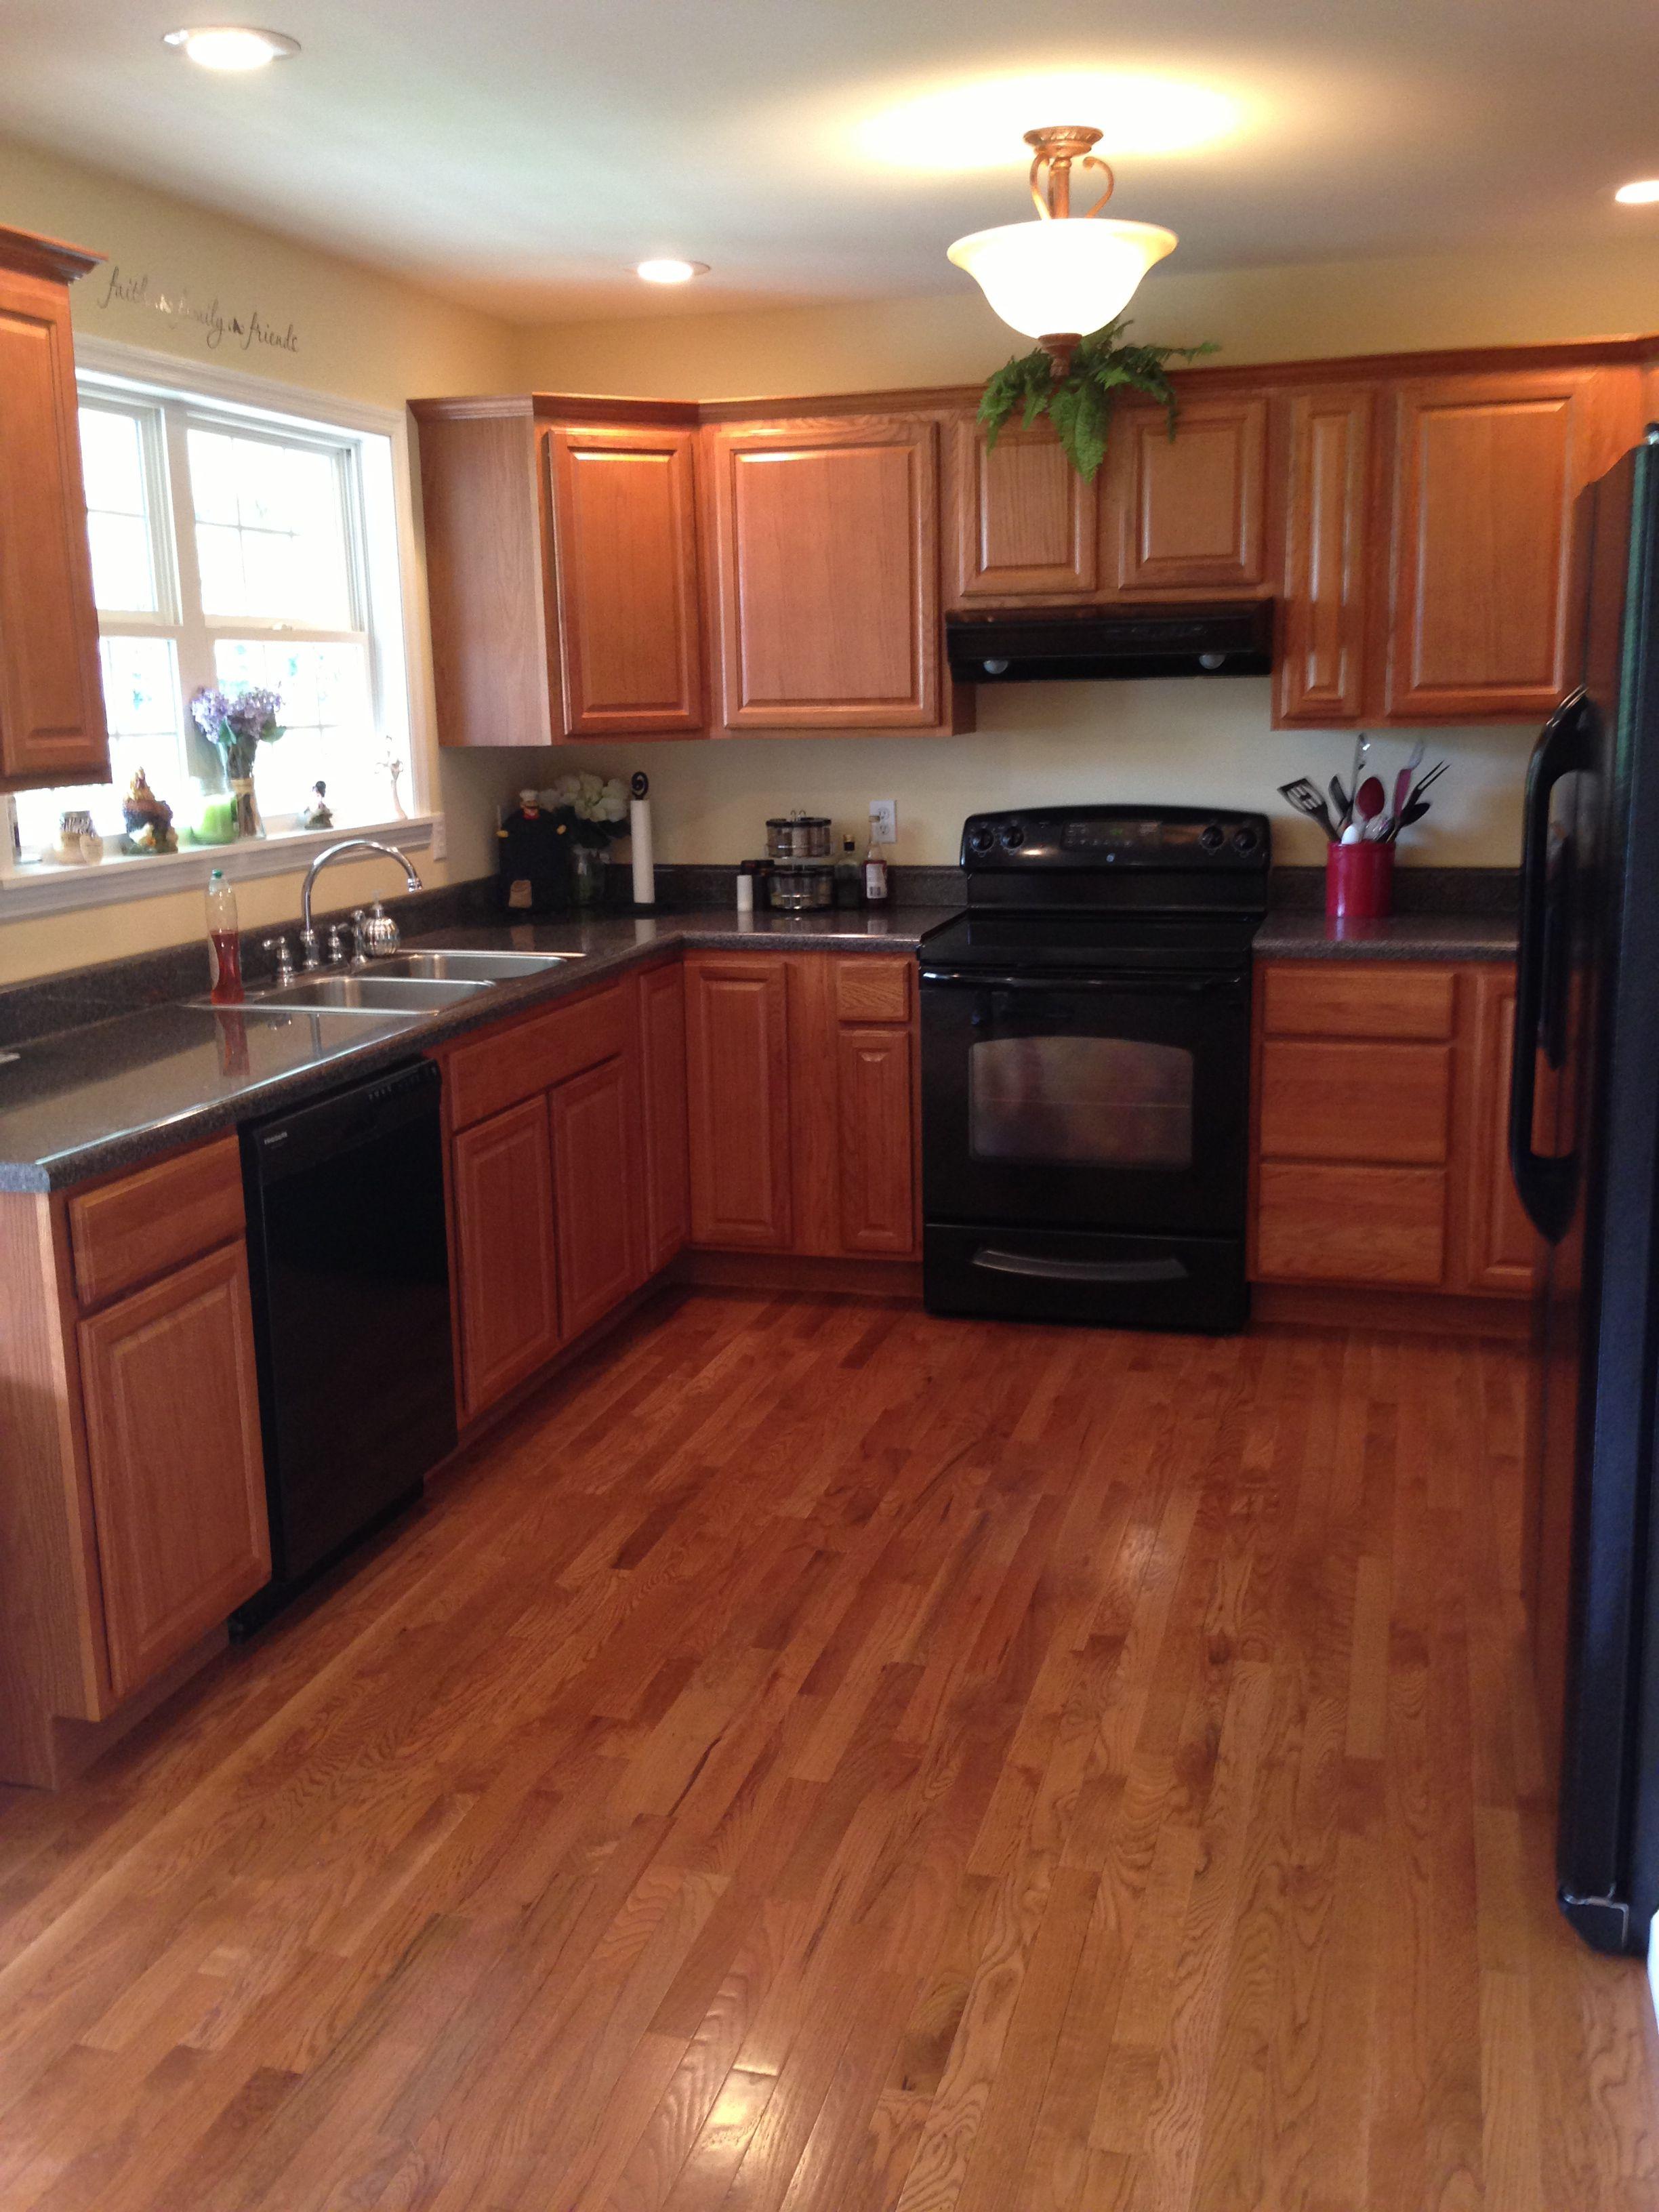 Black Kitchen Appliances Decoration Ideas 26 New Download